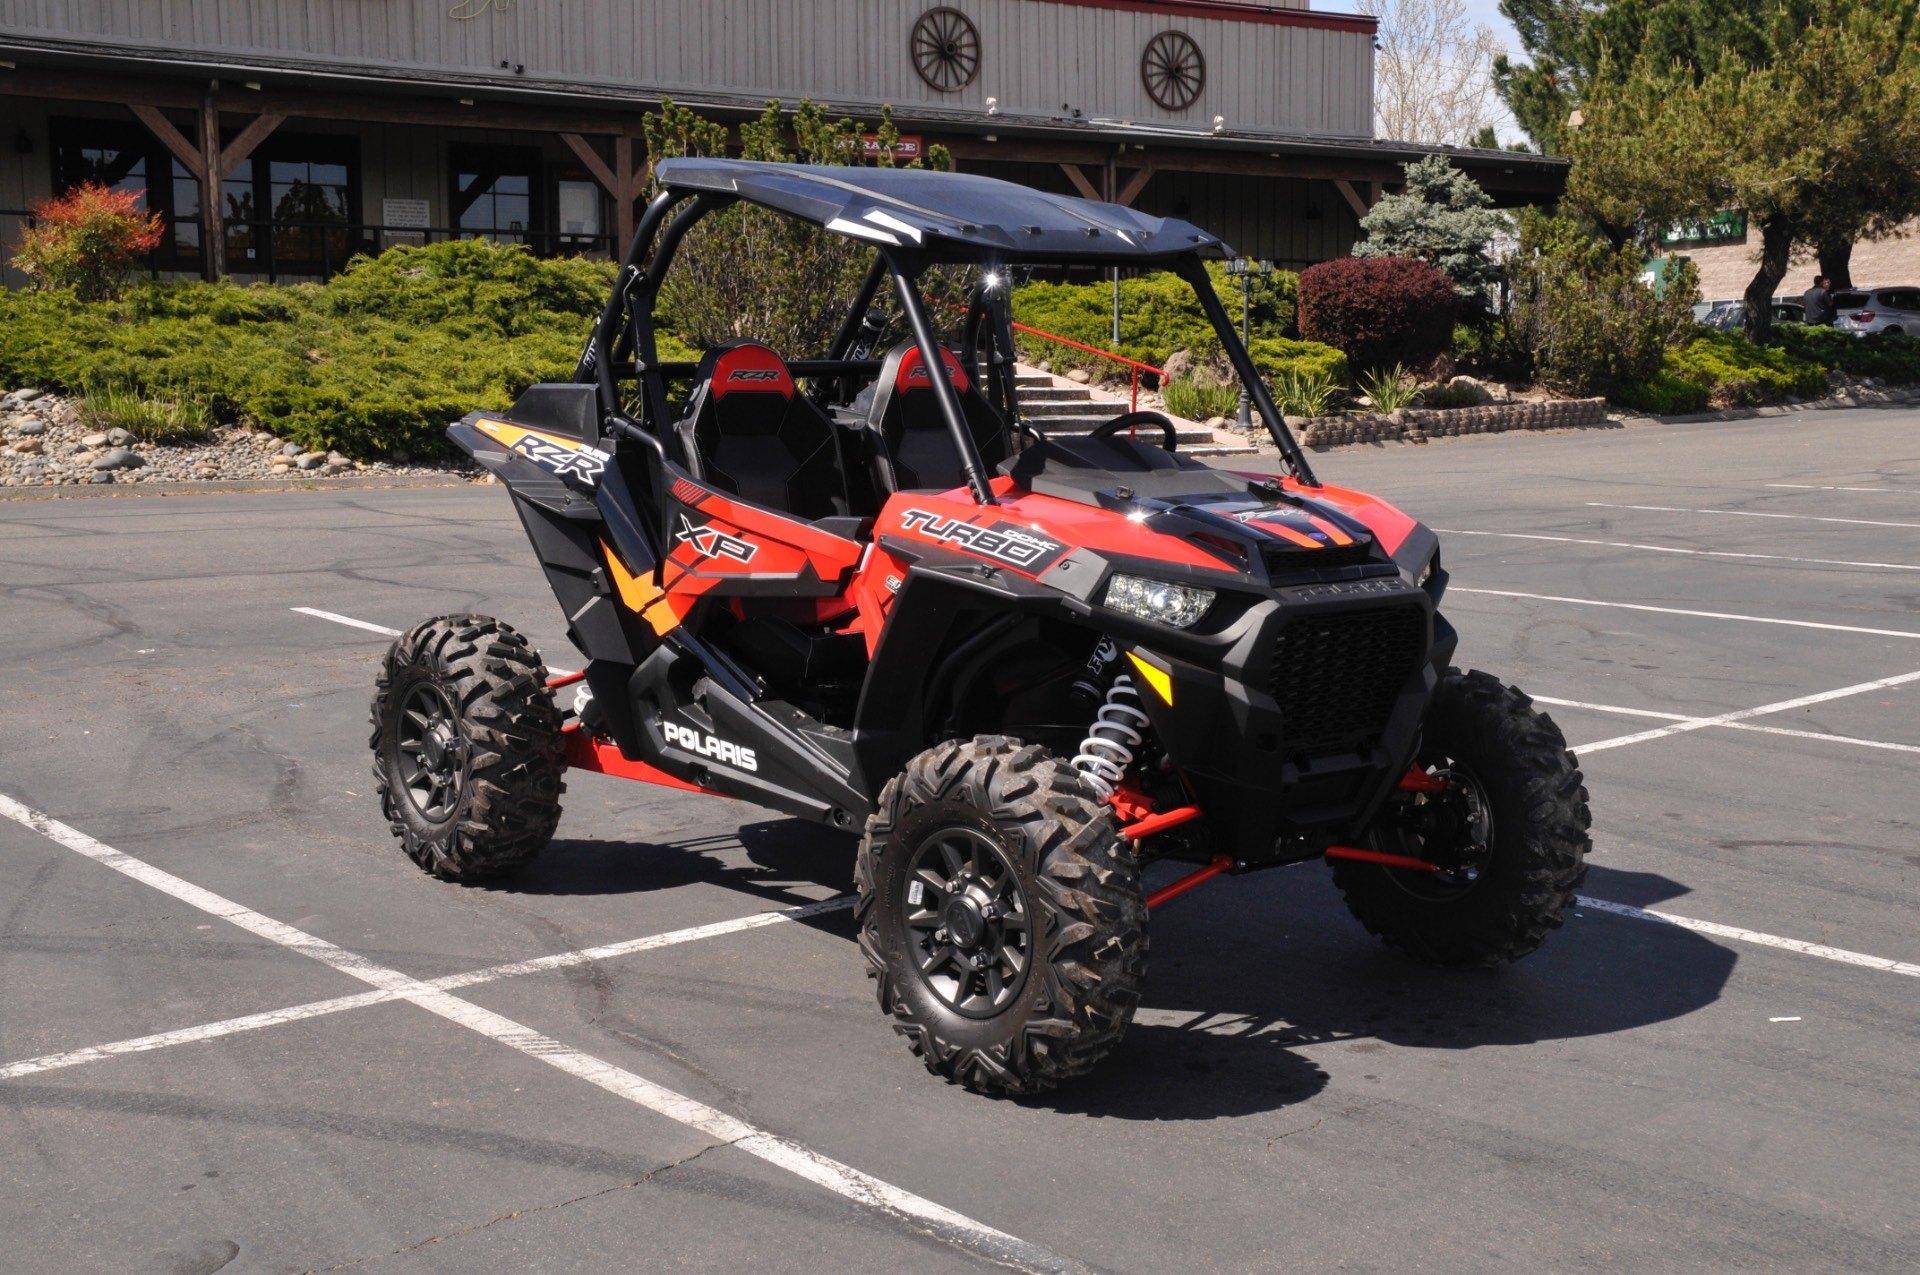 2017 Polaris RZR XP Turbo EPS in Roseville, California